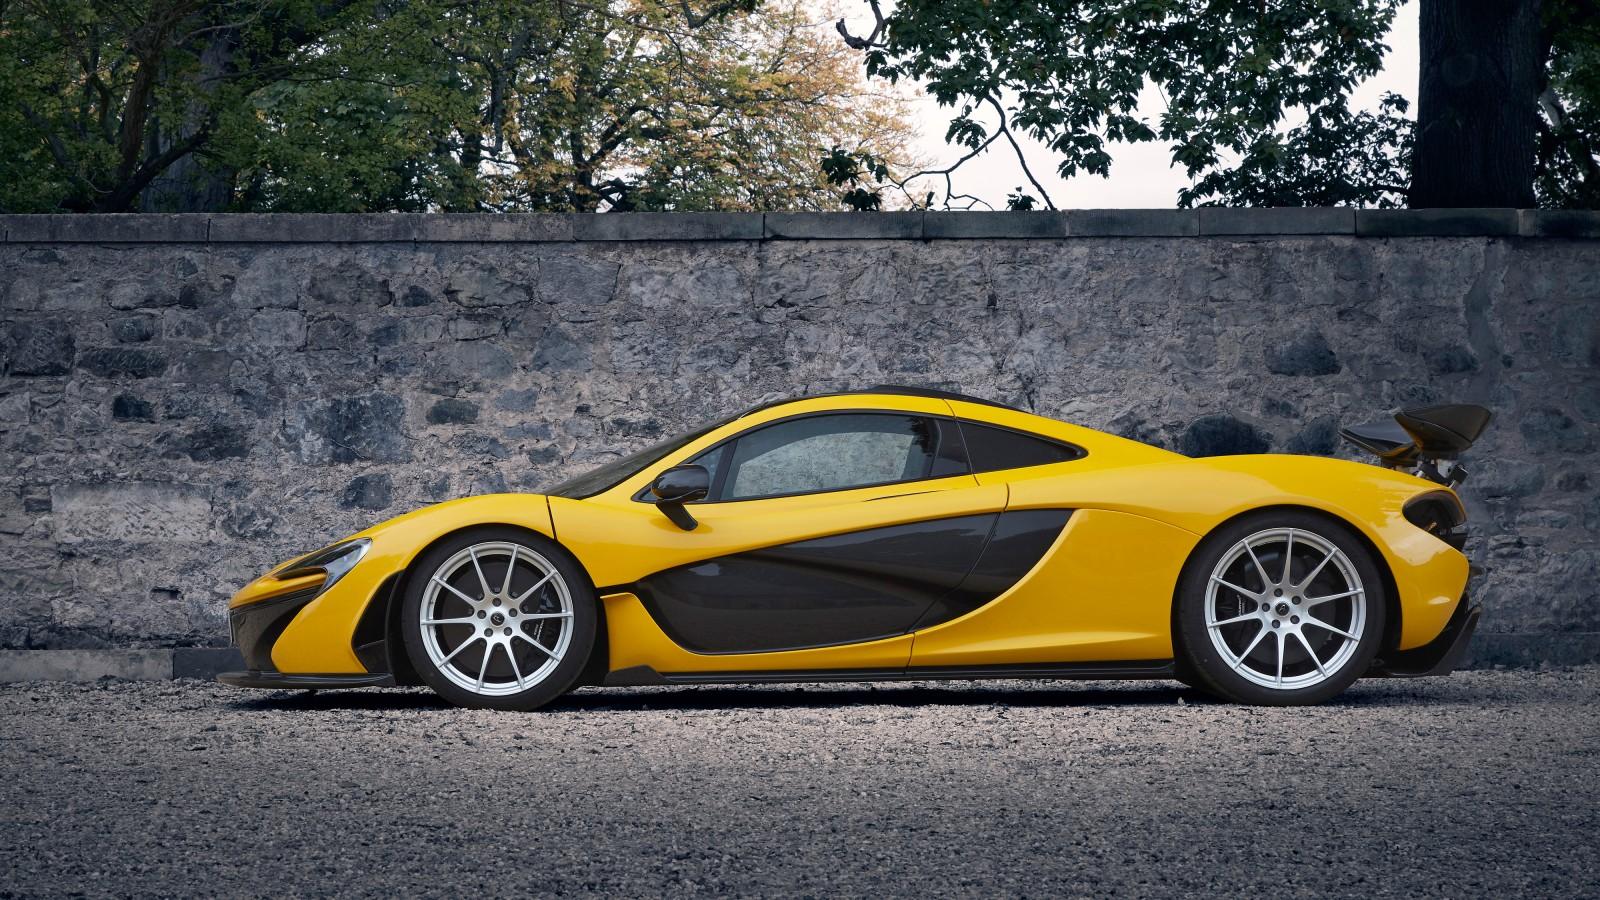 2017 McLaren P1 5th Anniversary 4K Wallpaper | HD Car ...